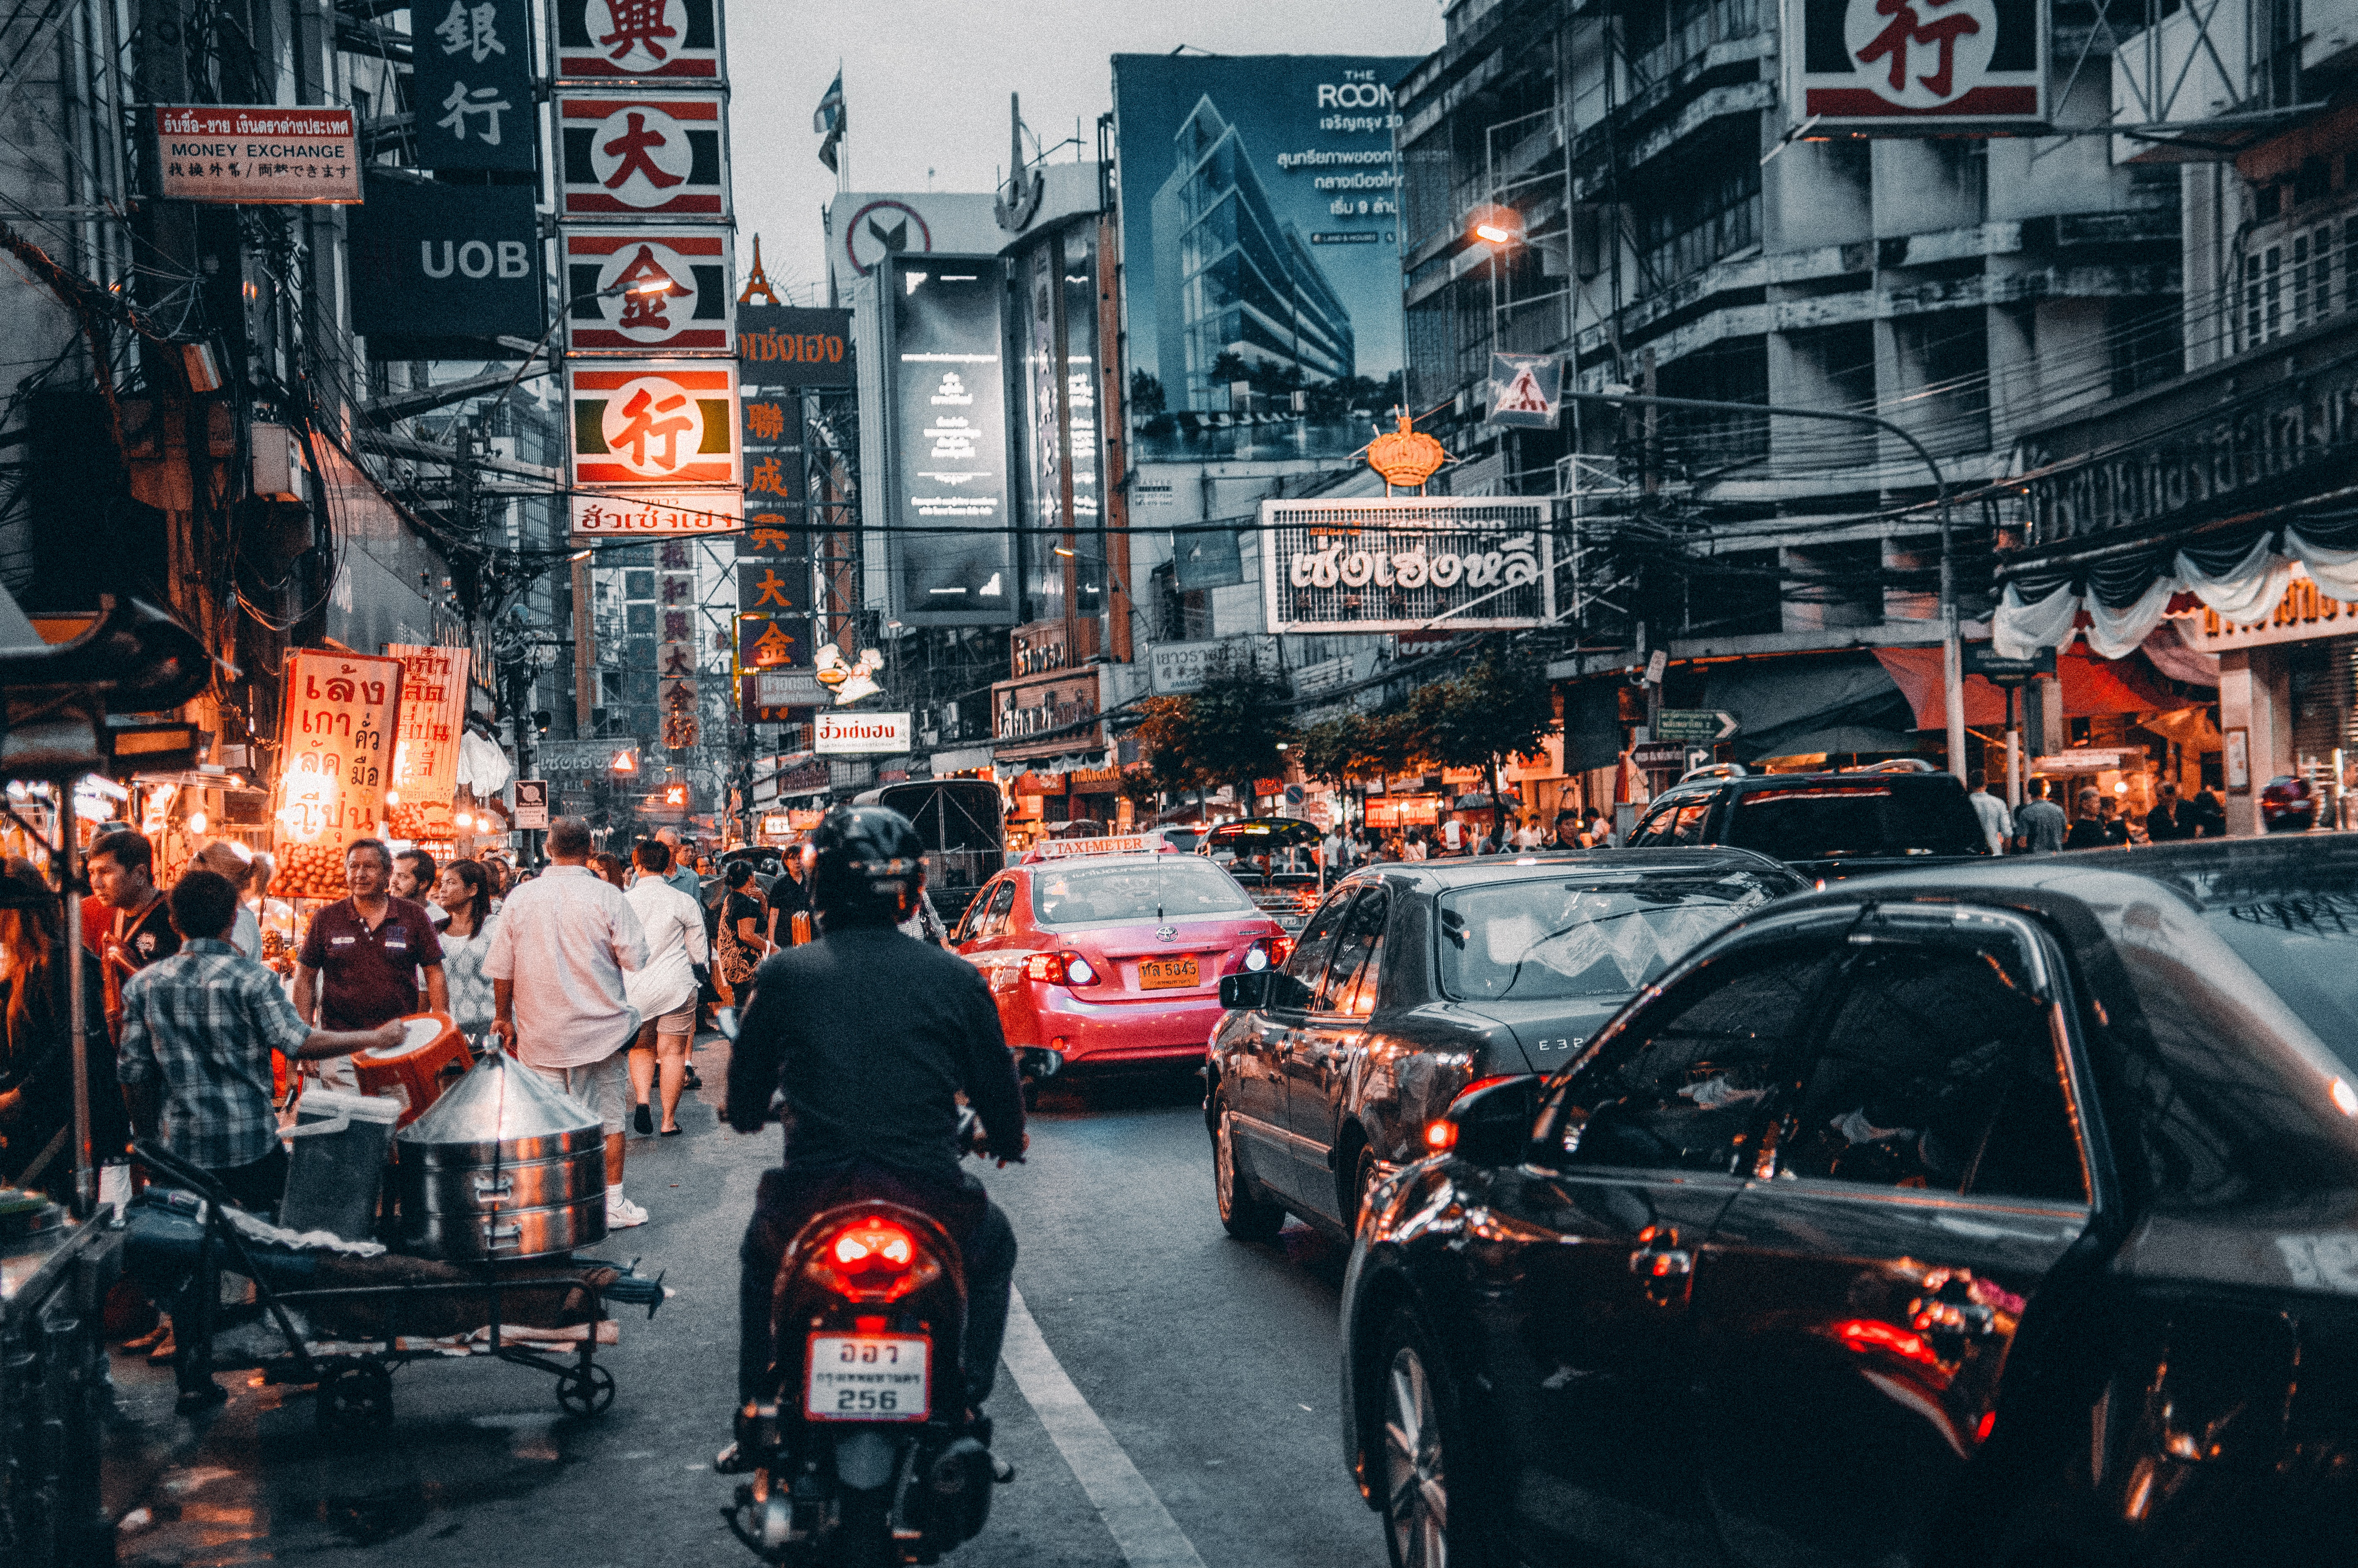 ASEAN地域へのEコマース展開、最重要課題は「物流」にあり…